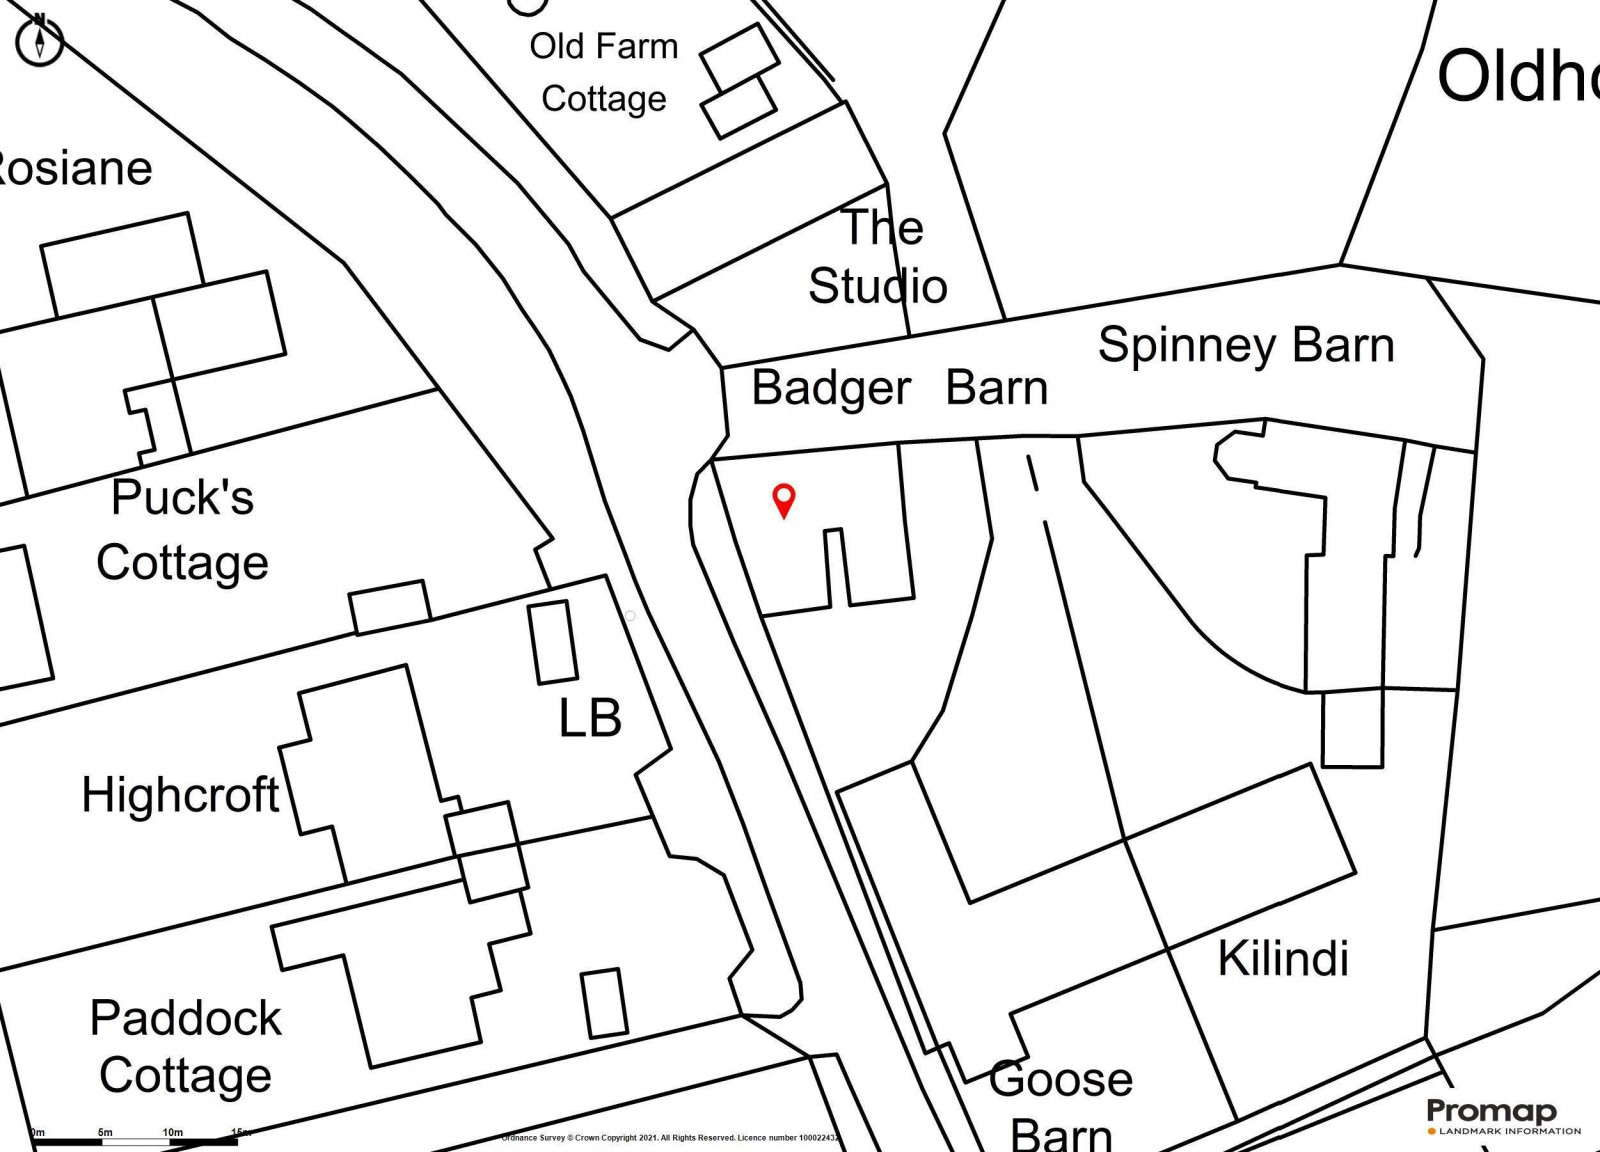 Badger Barn